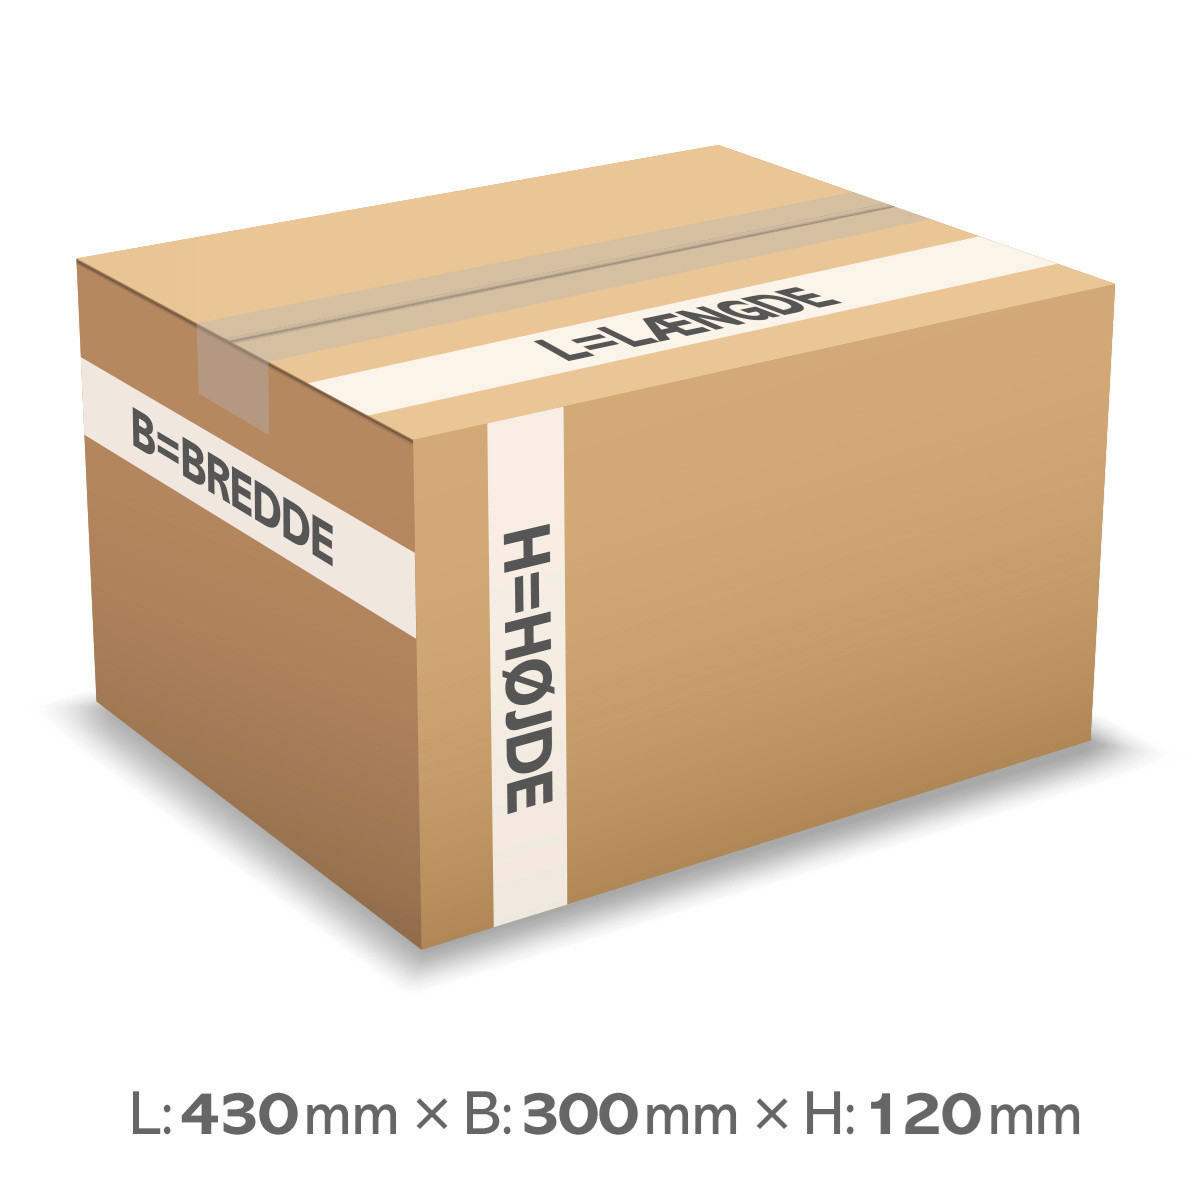 Bølgepapkasse Master'In 430x300x120mm 5029 - 15L - 4mm